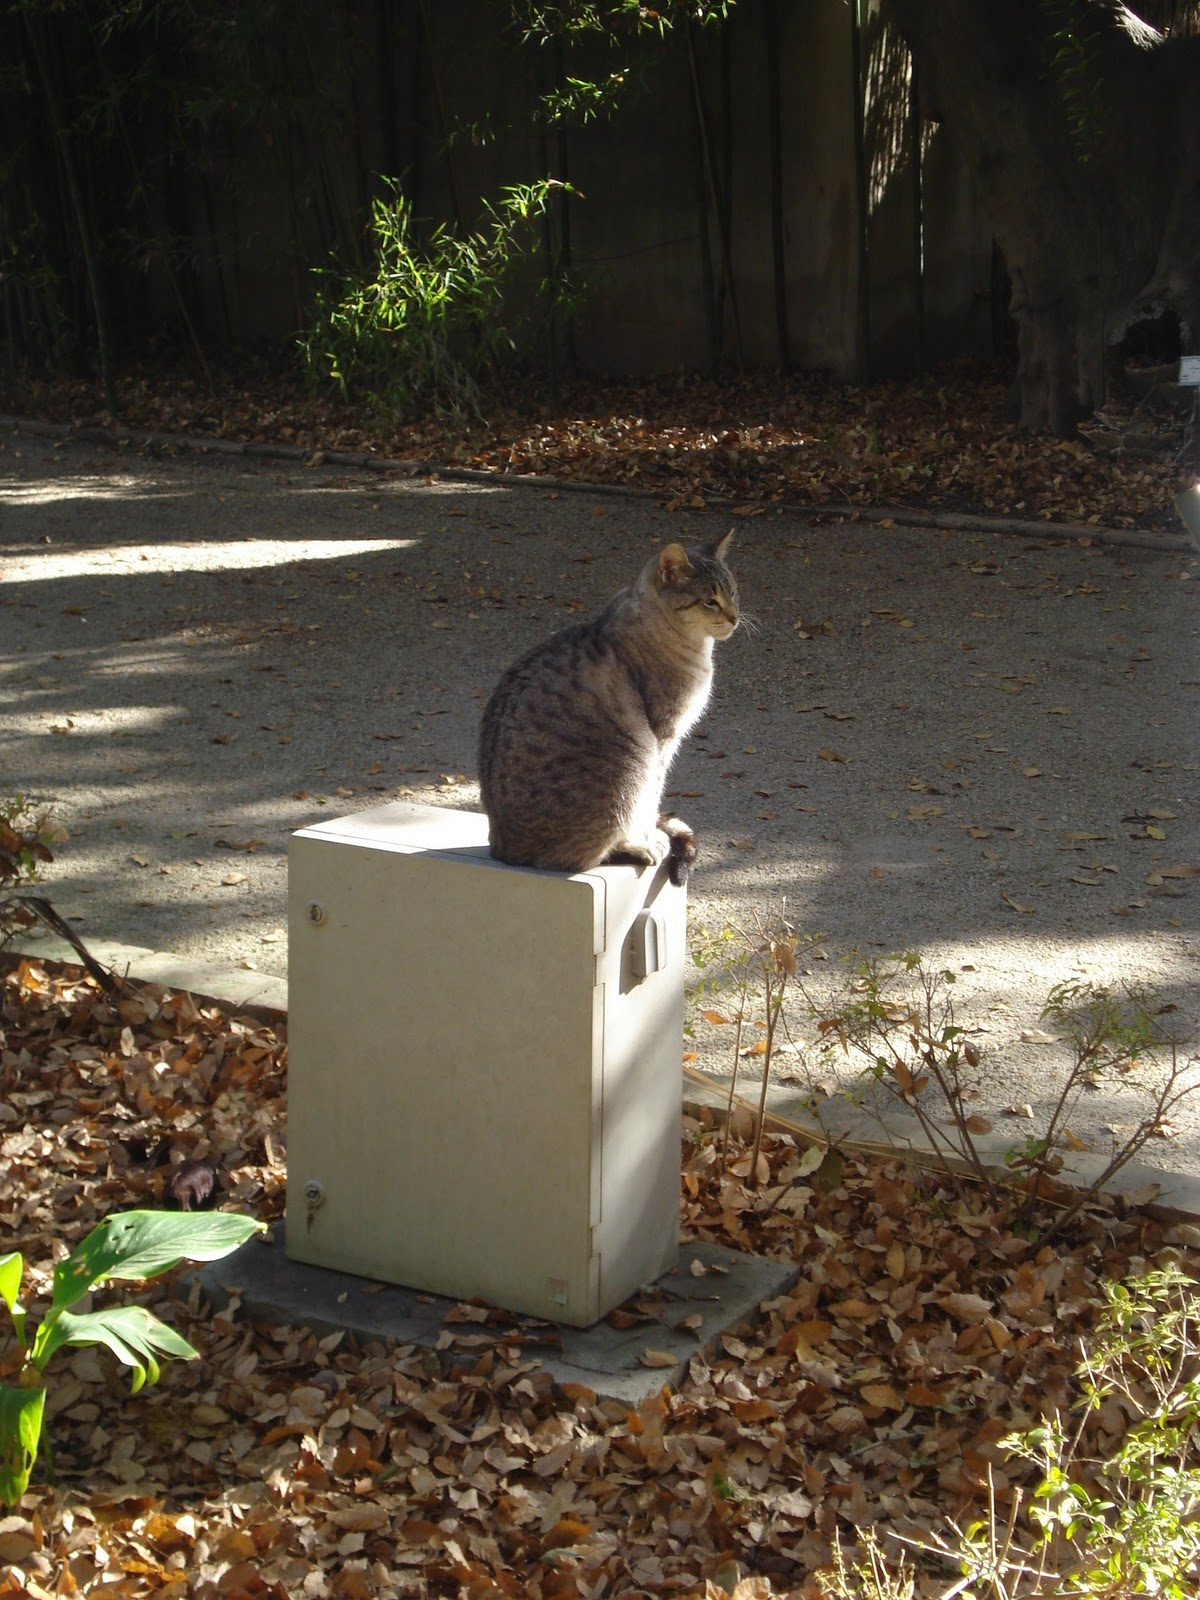 Chic souffl los gatos del jard n bot nico for Ahuyentar gatos de mi jardin